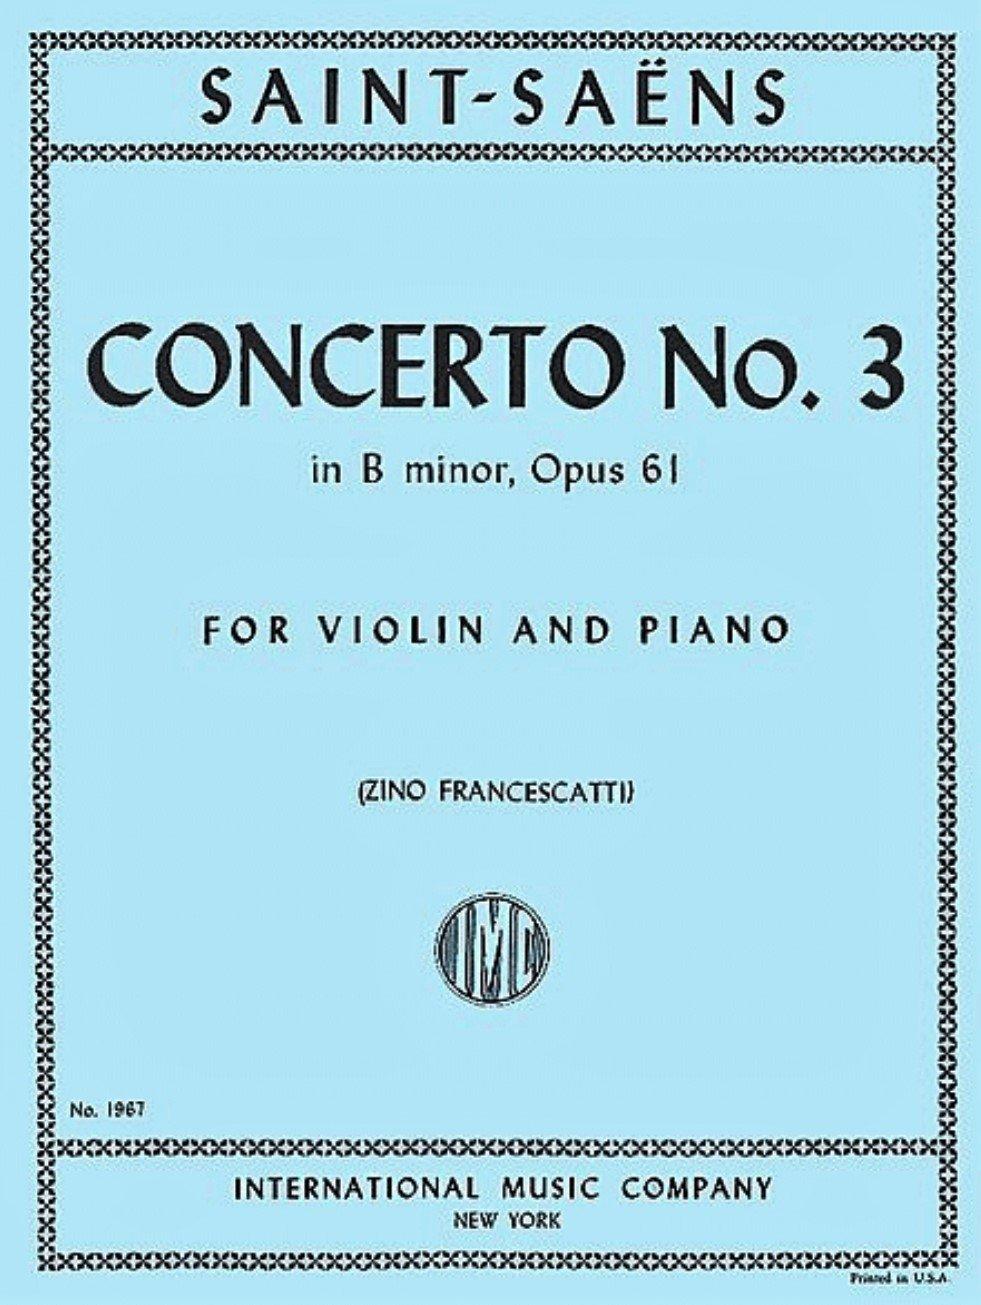 Concerto # 3 in B minor Op 61 - Saint-Saens - Violin - Francescatti - International